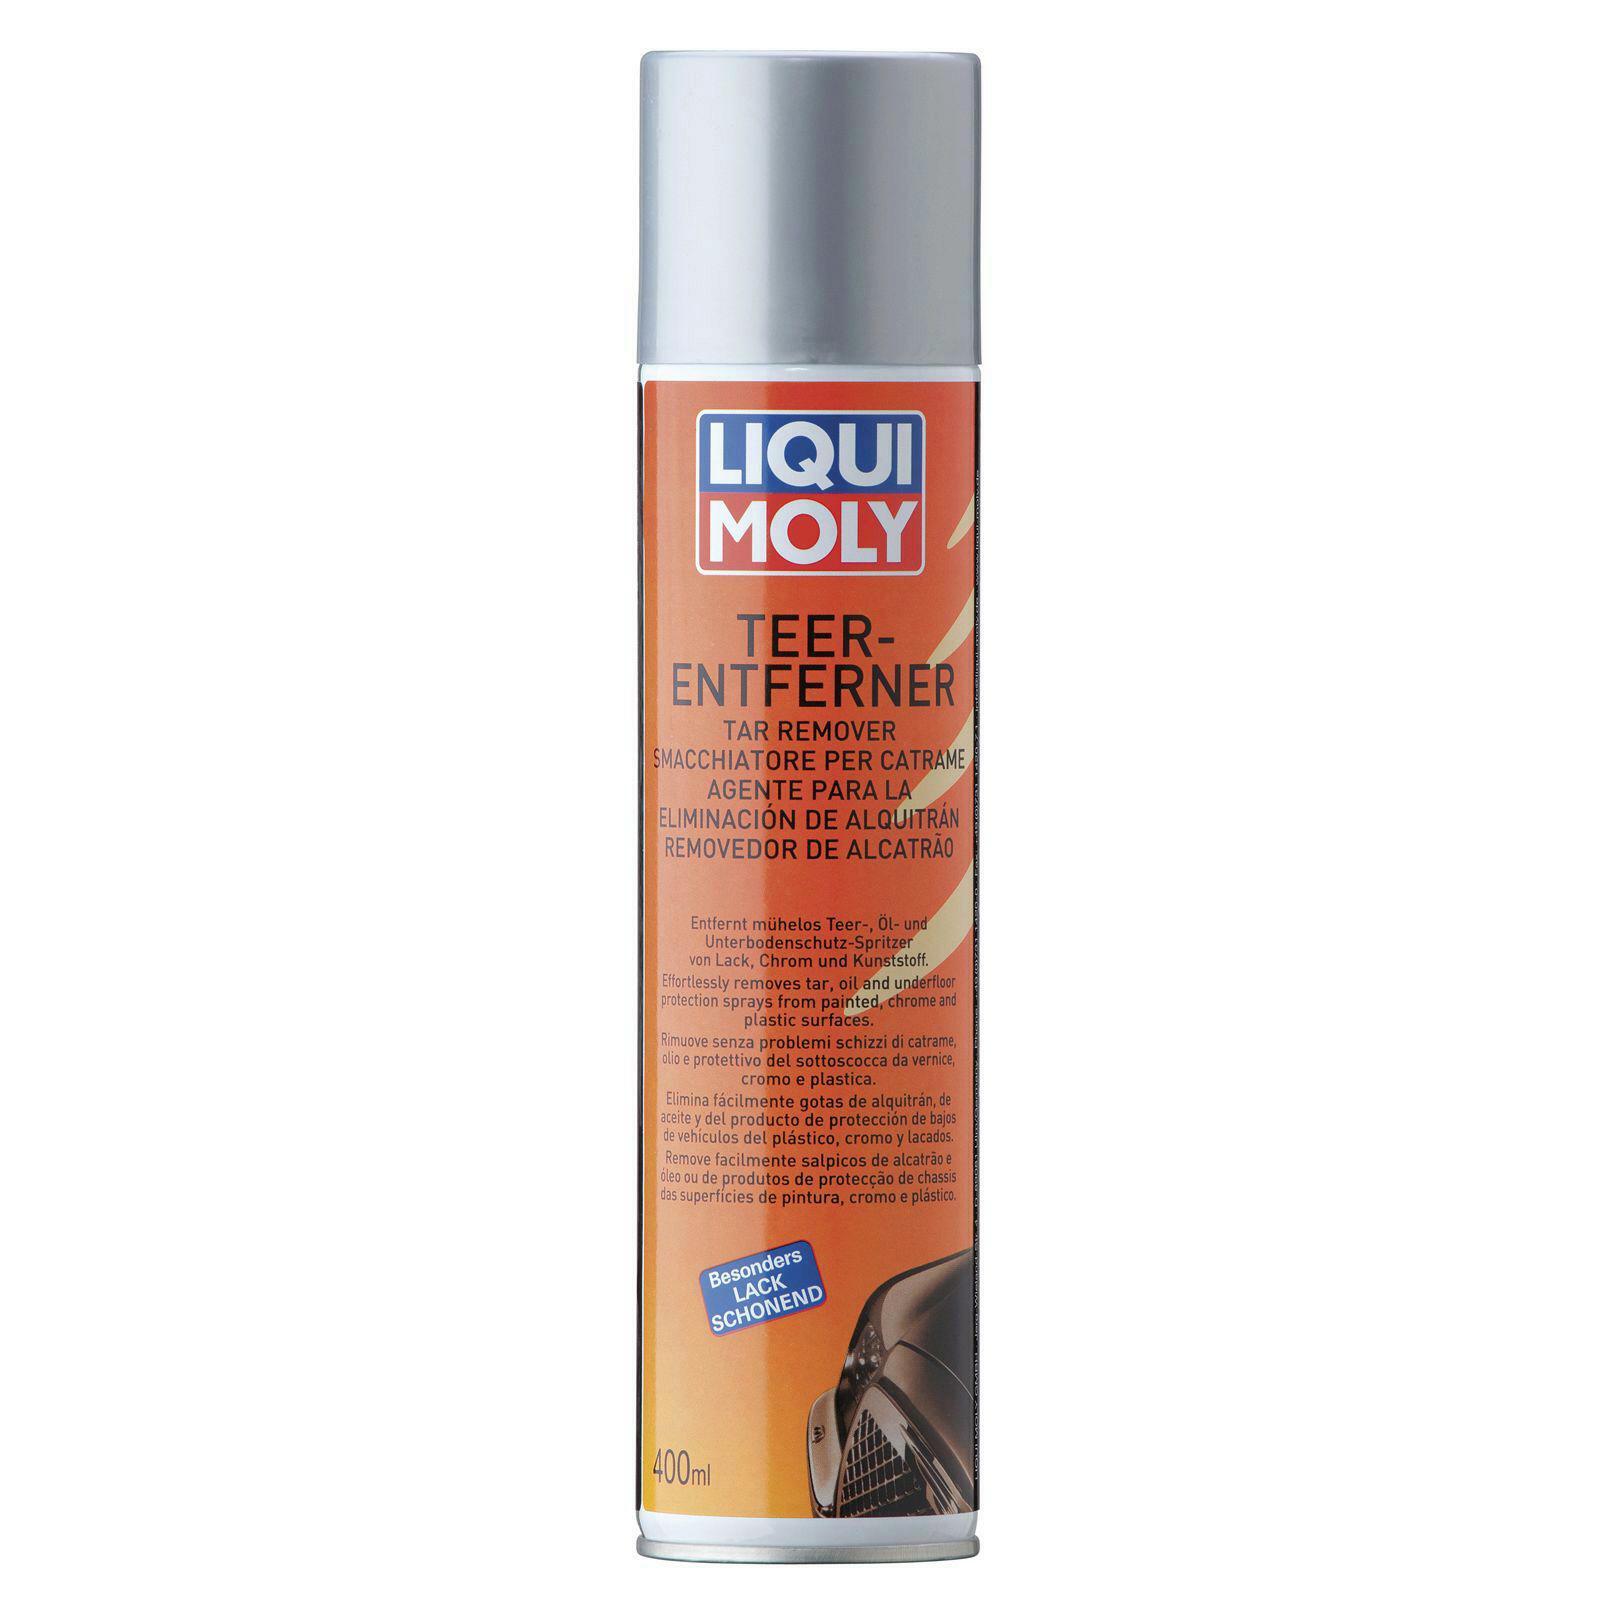 Liqui Moly Teer-Entferner 400ml